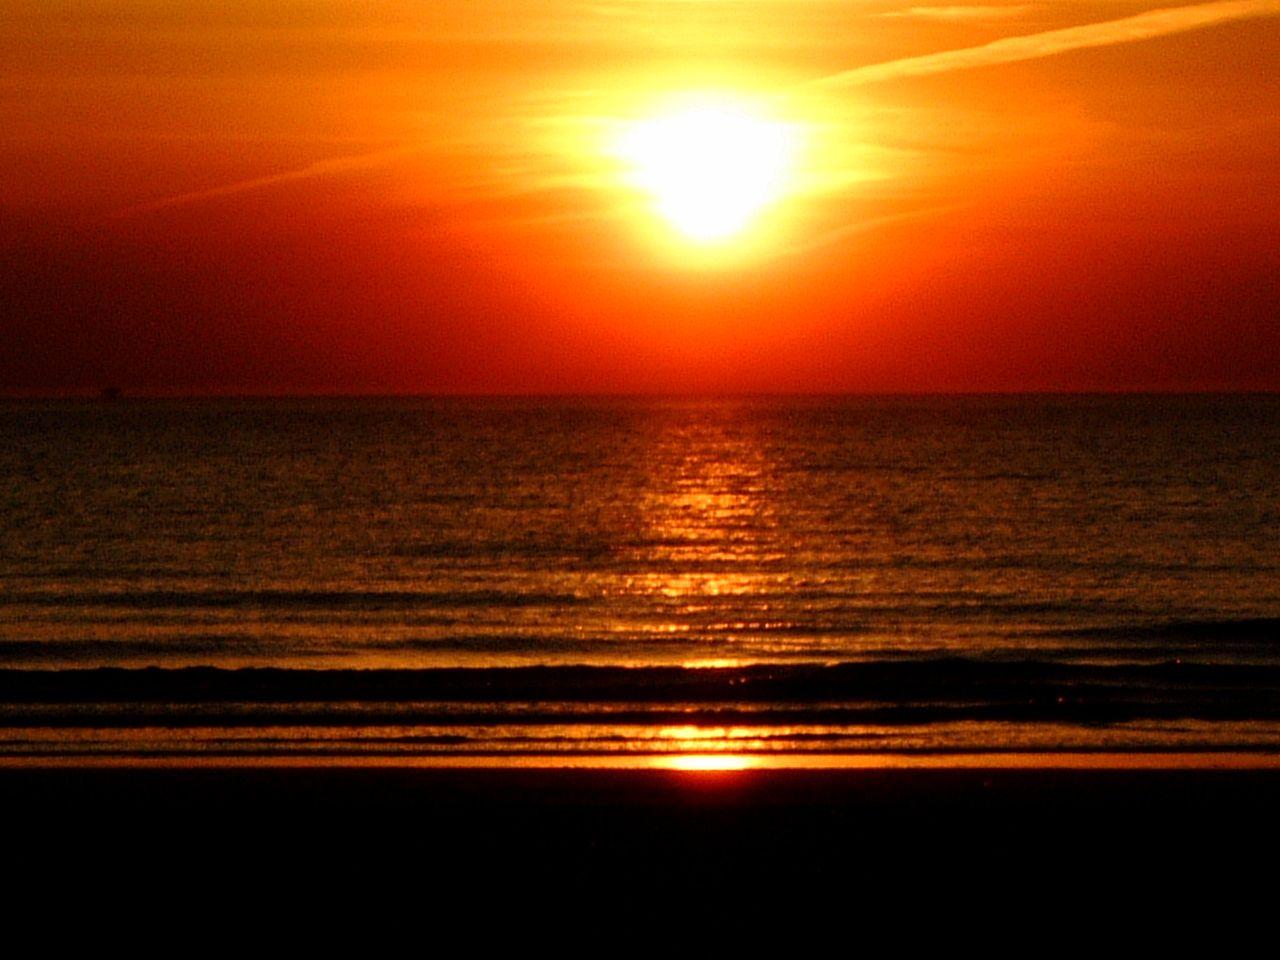 Pretty Beautiful Sunsets Seascapes Water Sea Beachscapes Beach Sunset Sunrise Dusk Dawn Sun Sunset Landscape Sunrise Sunset Seascape